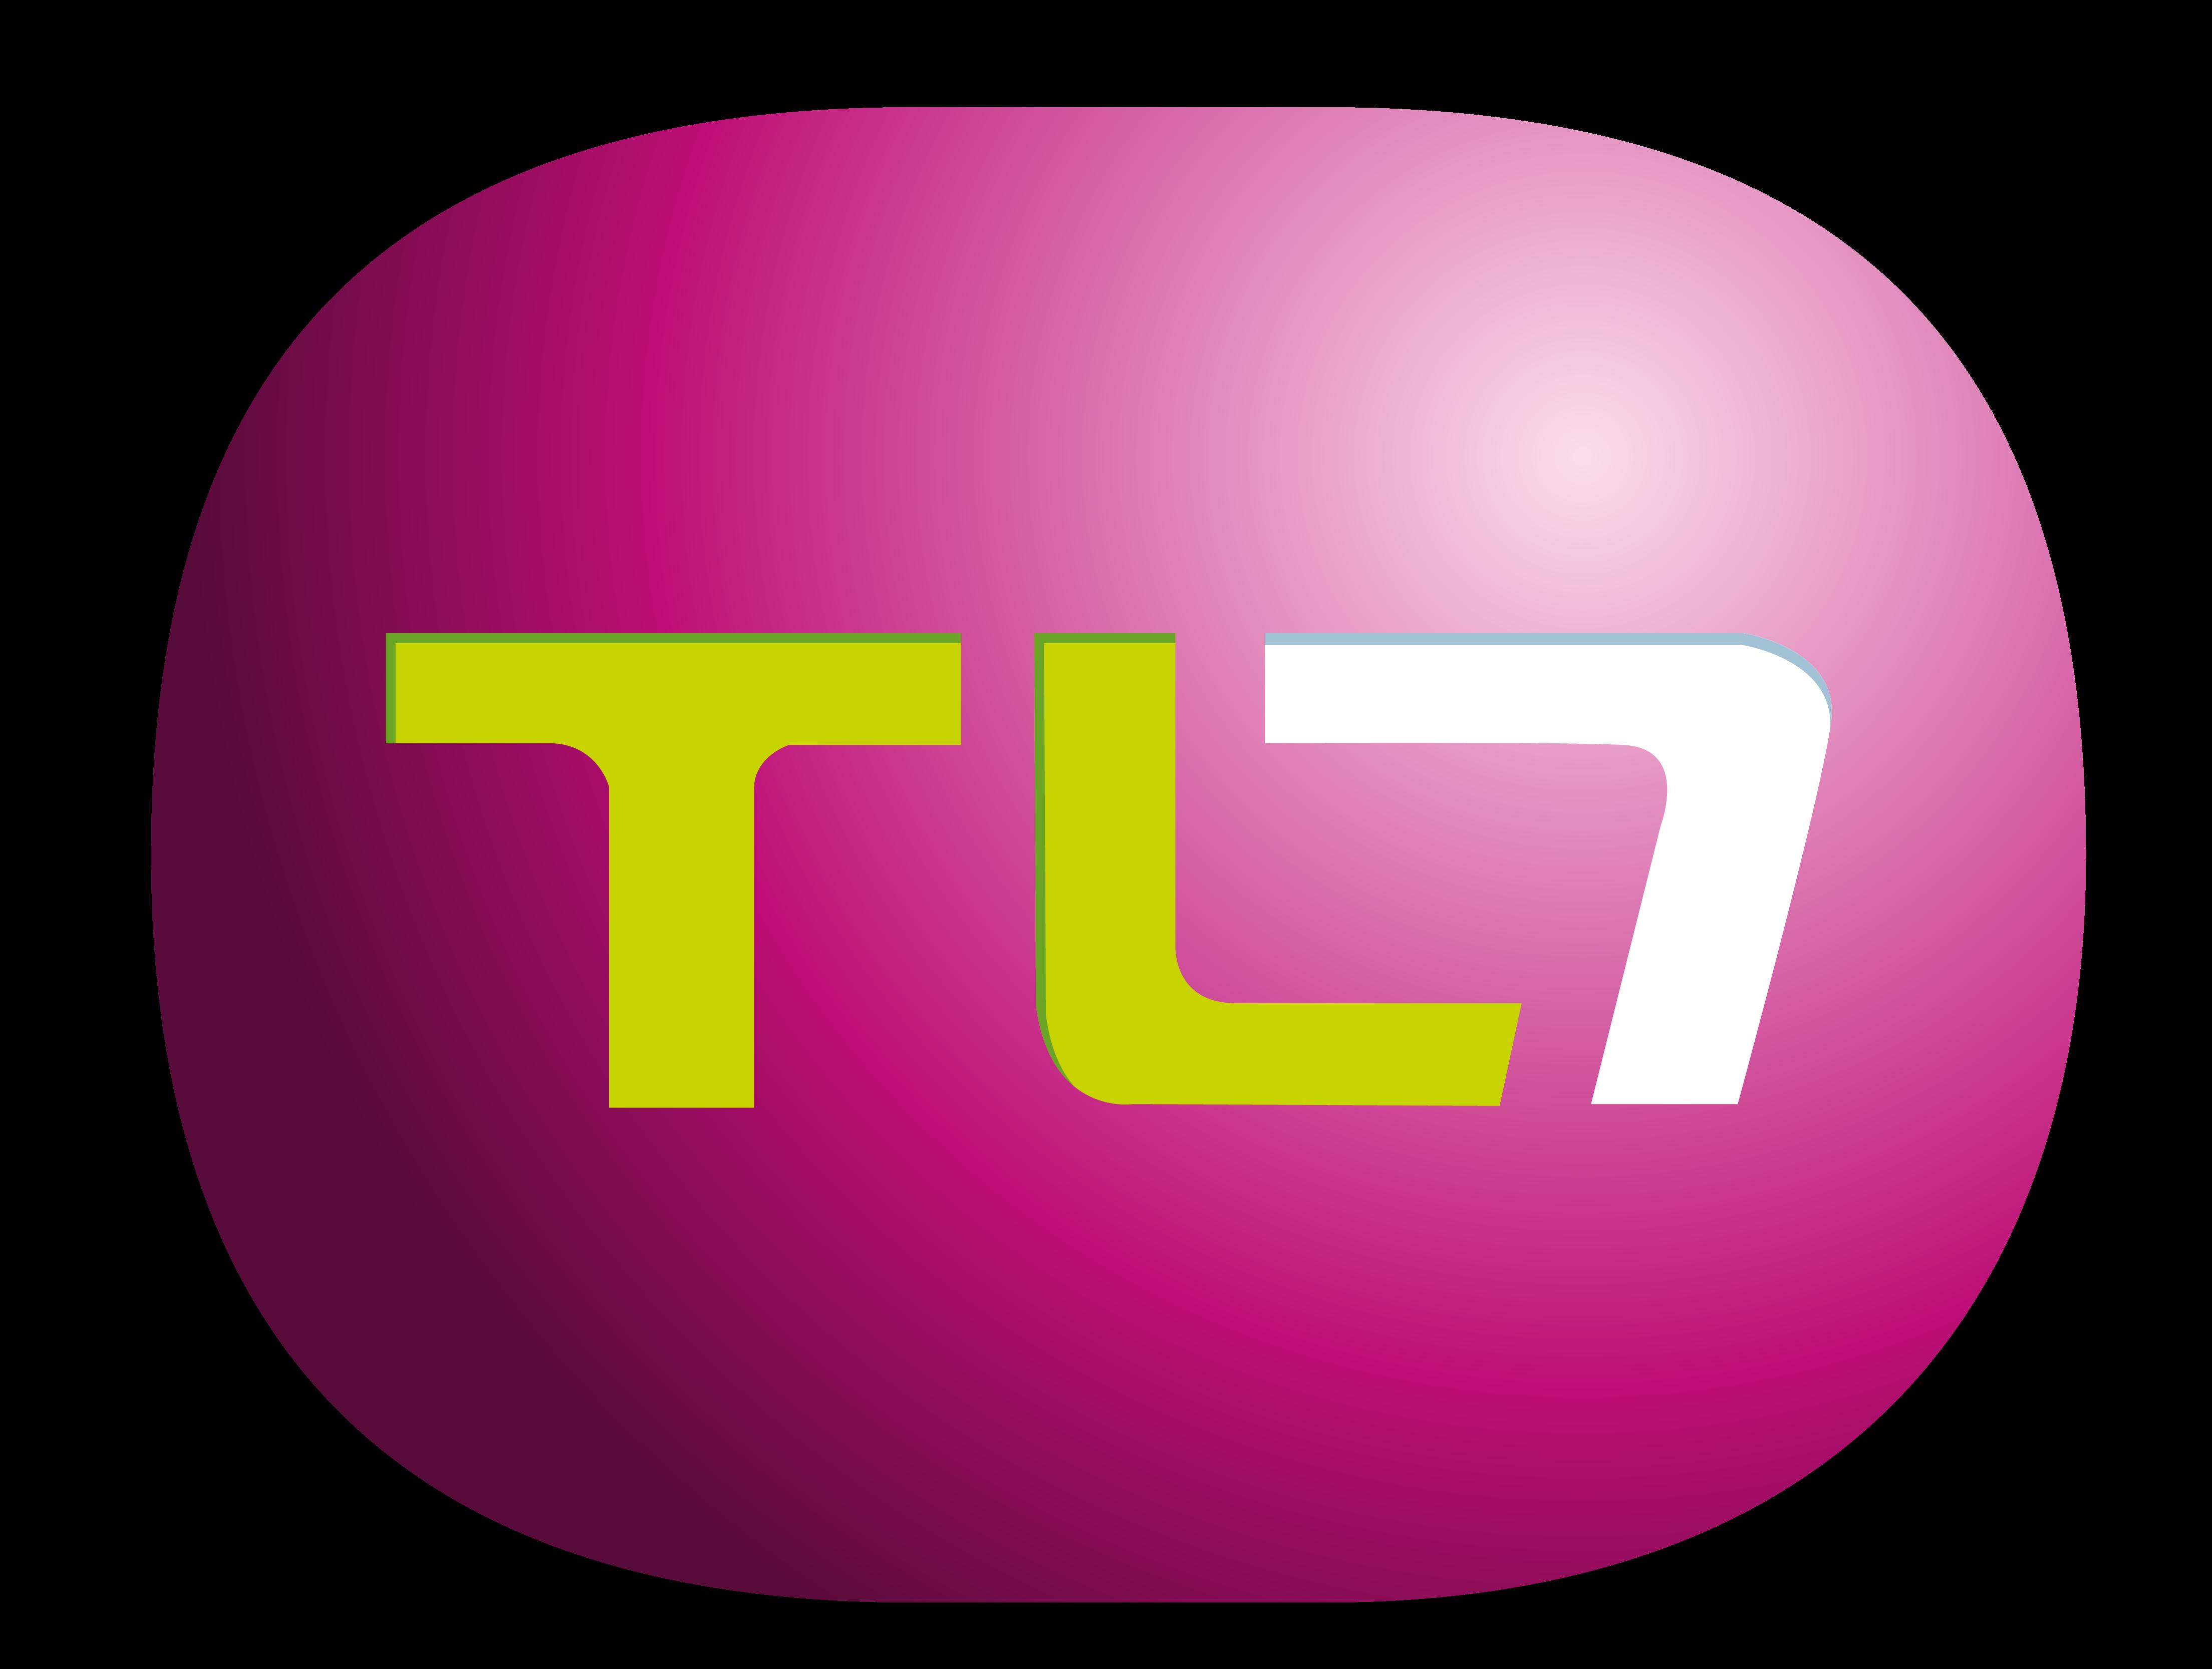 LOGO_TL7